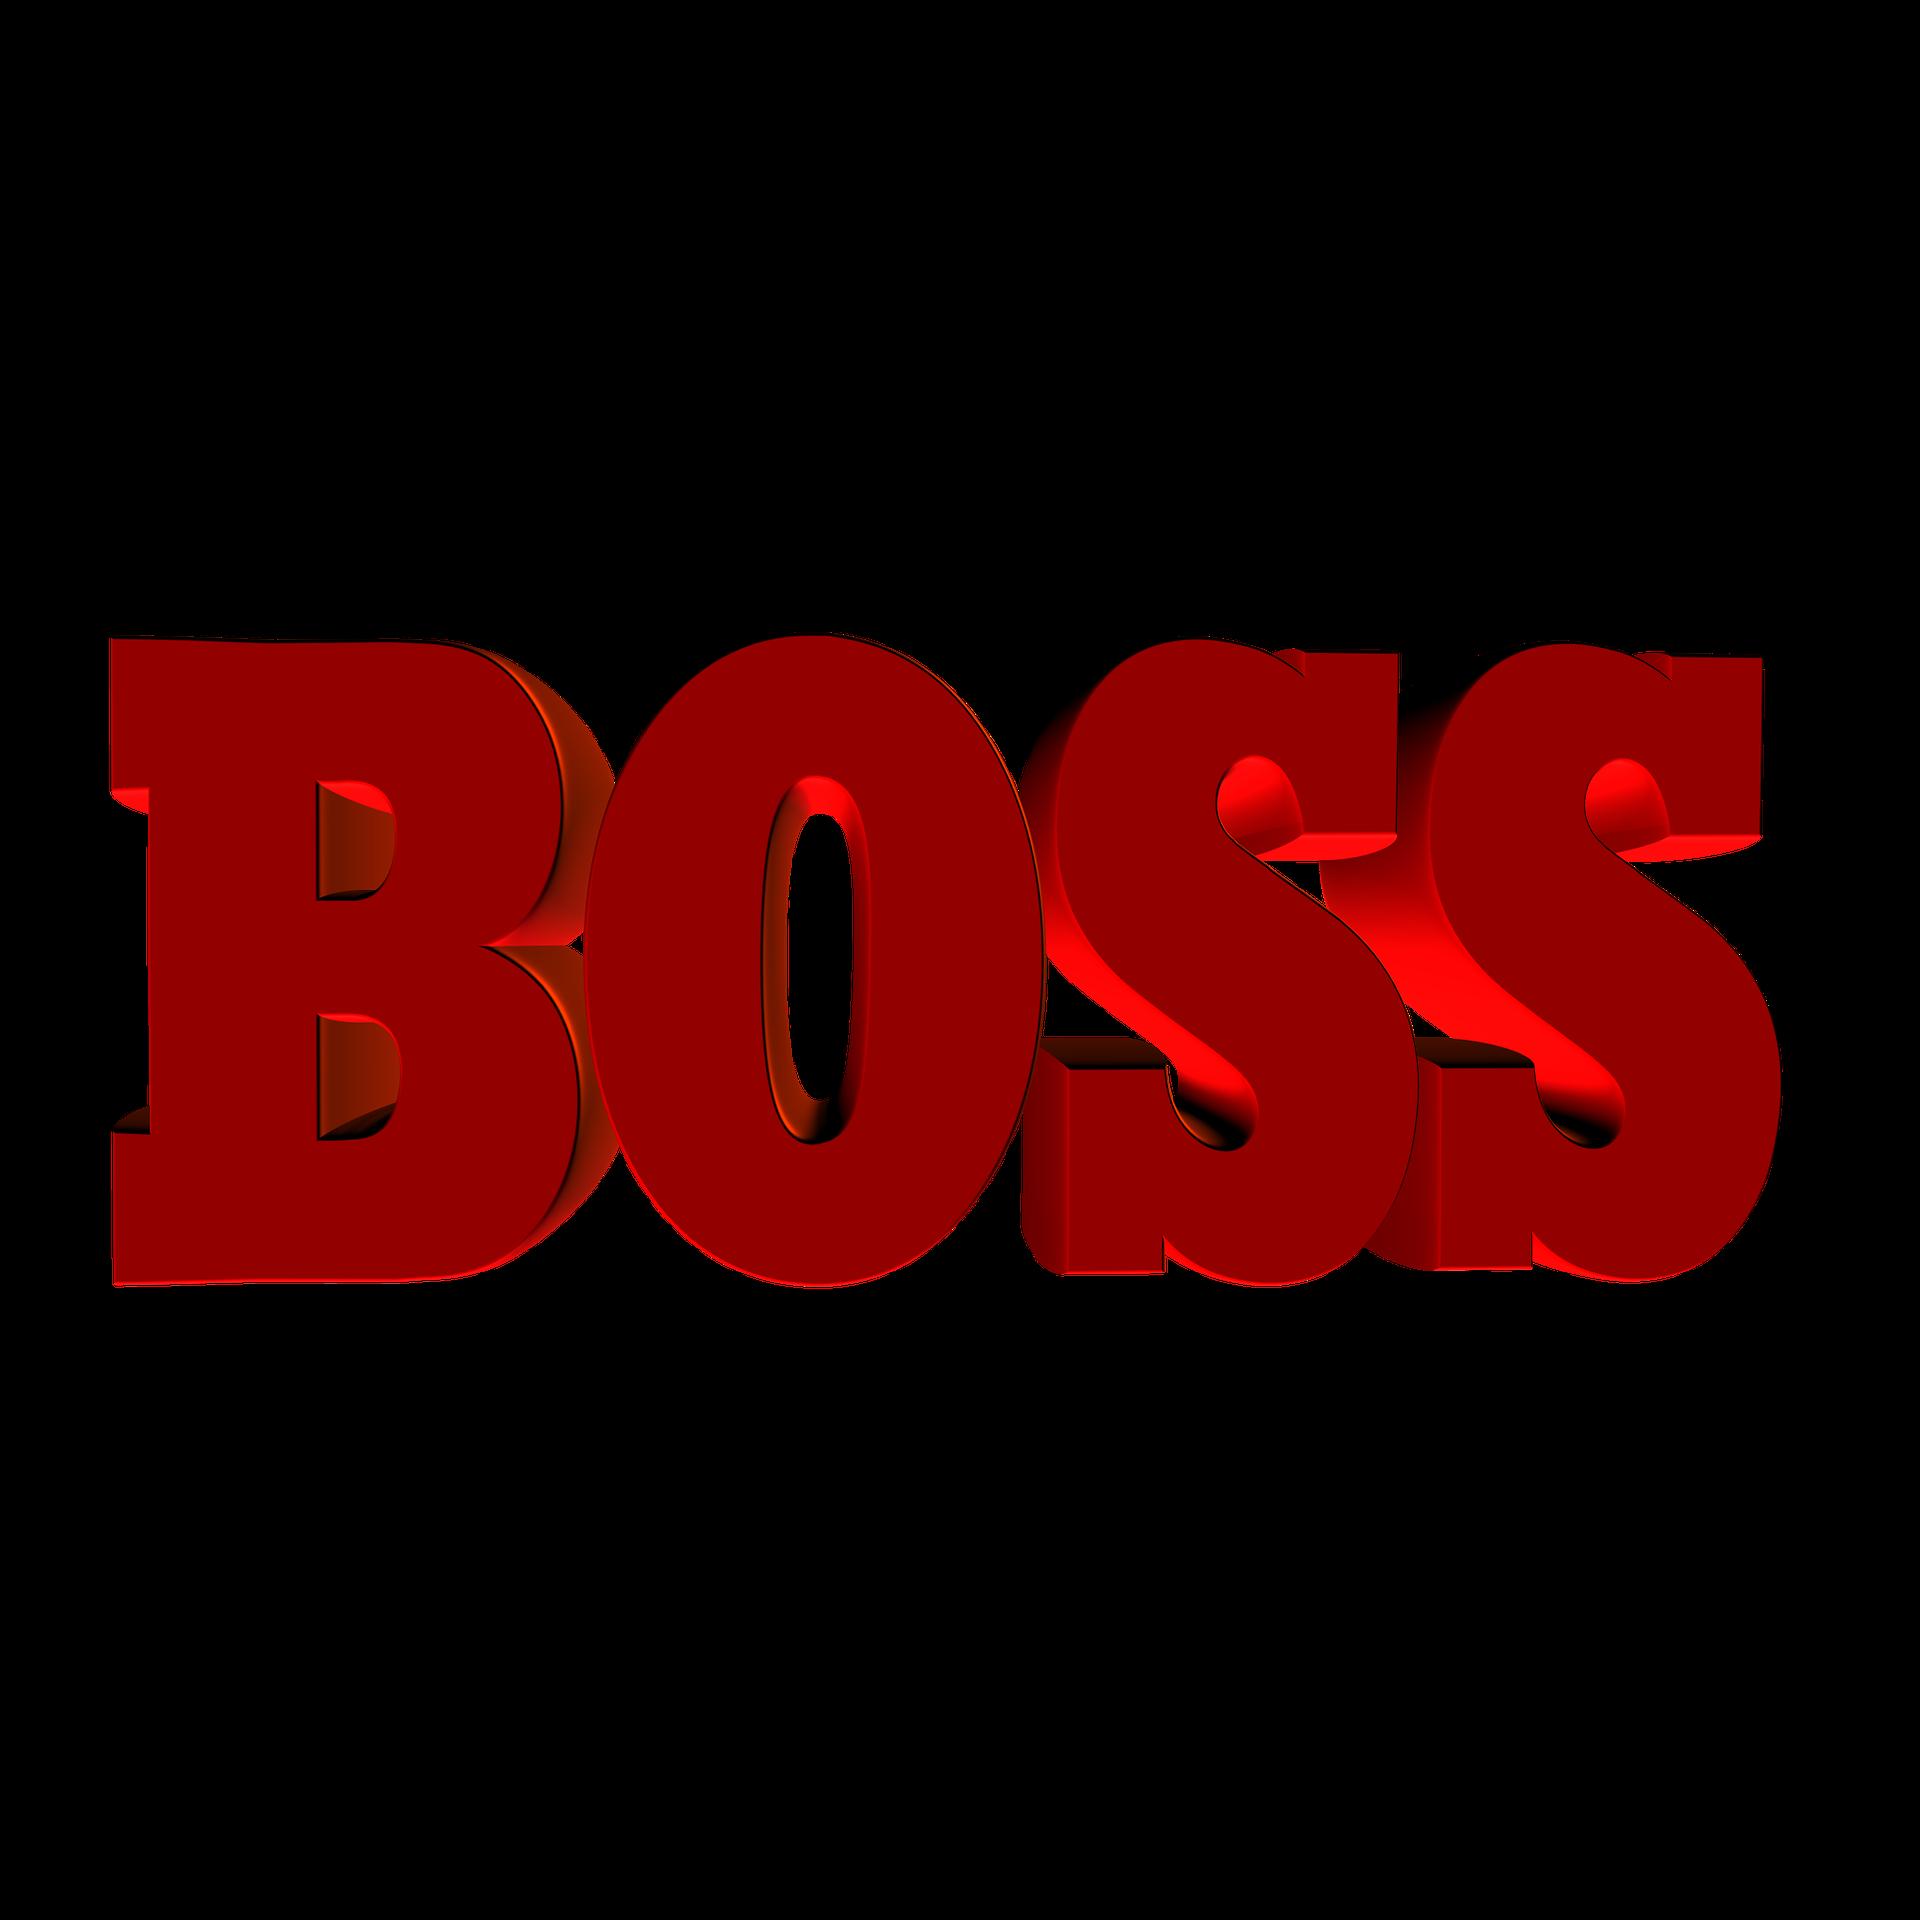 boss-432713_1920